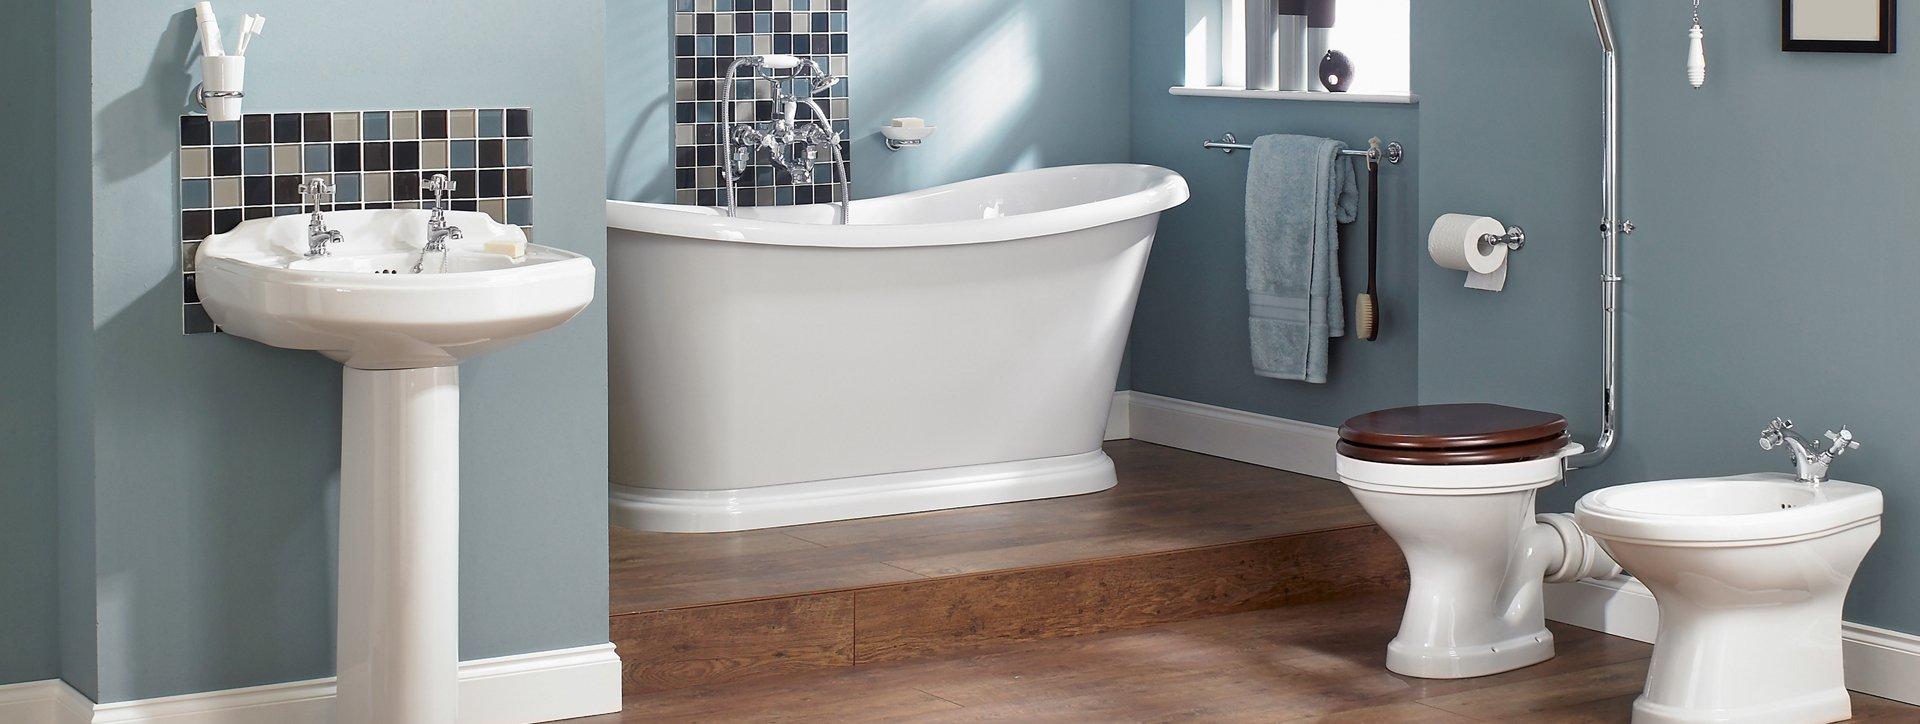 High quality bathroom installations in Newton Abbot